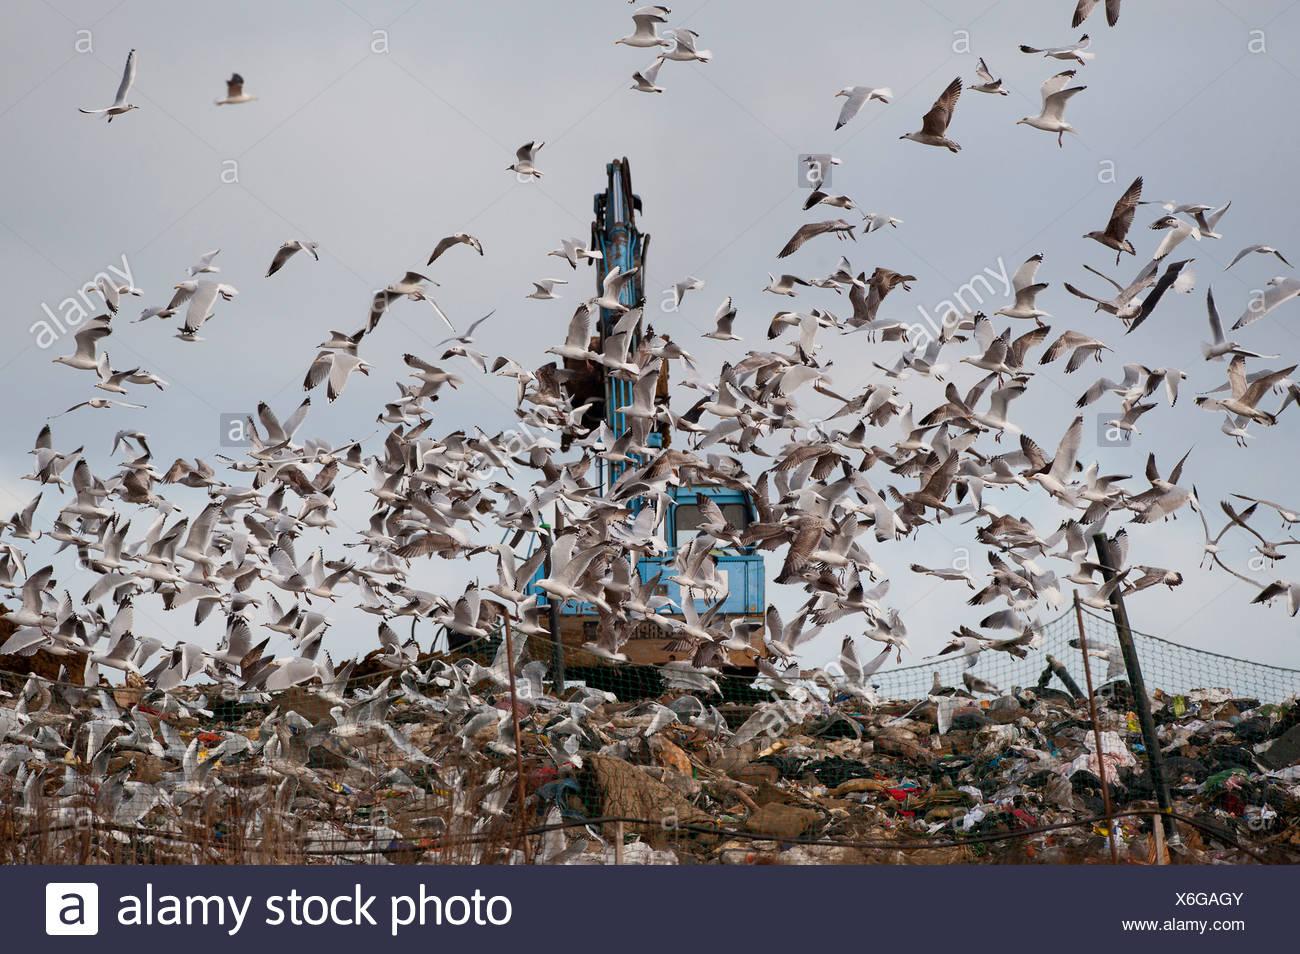 Gulls mainly Herring and Black-headed Gulls on rubbish tip Edgfield Norfolk winter - Stock Image